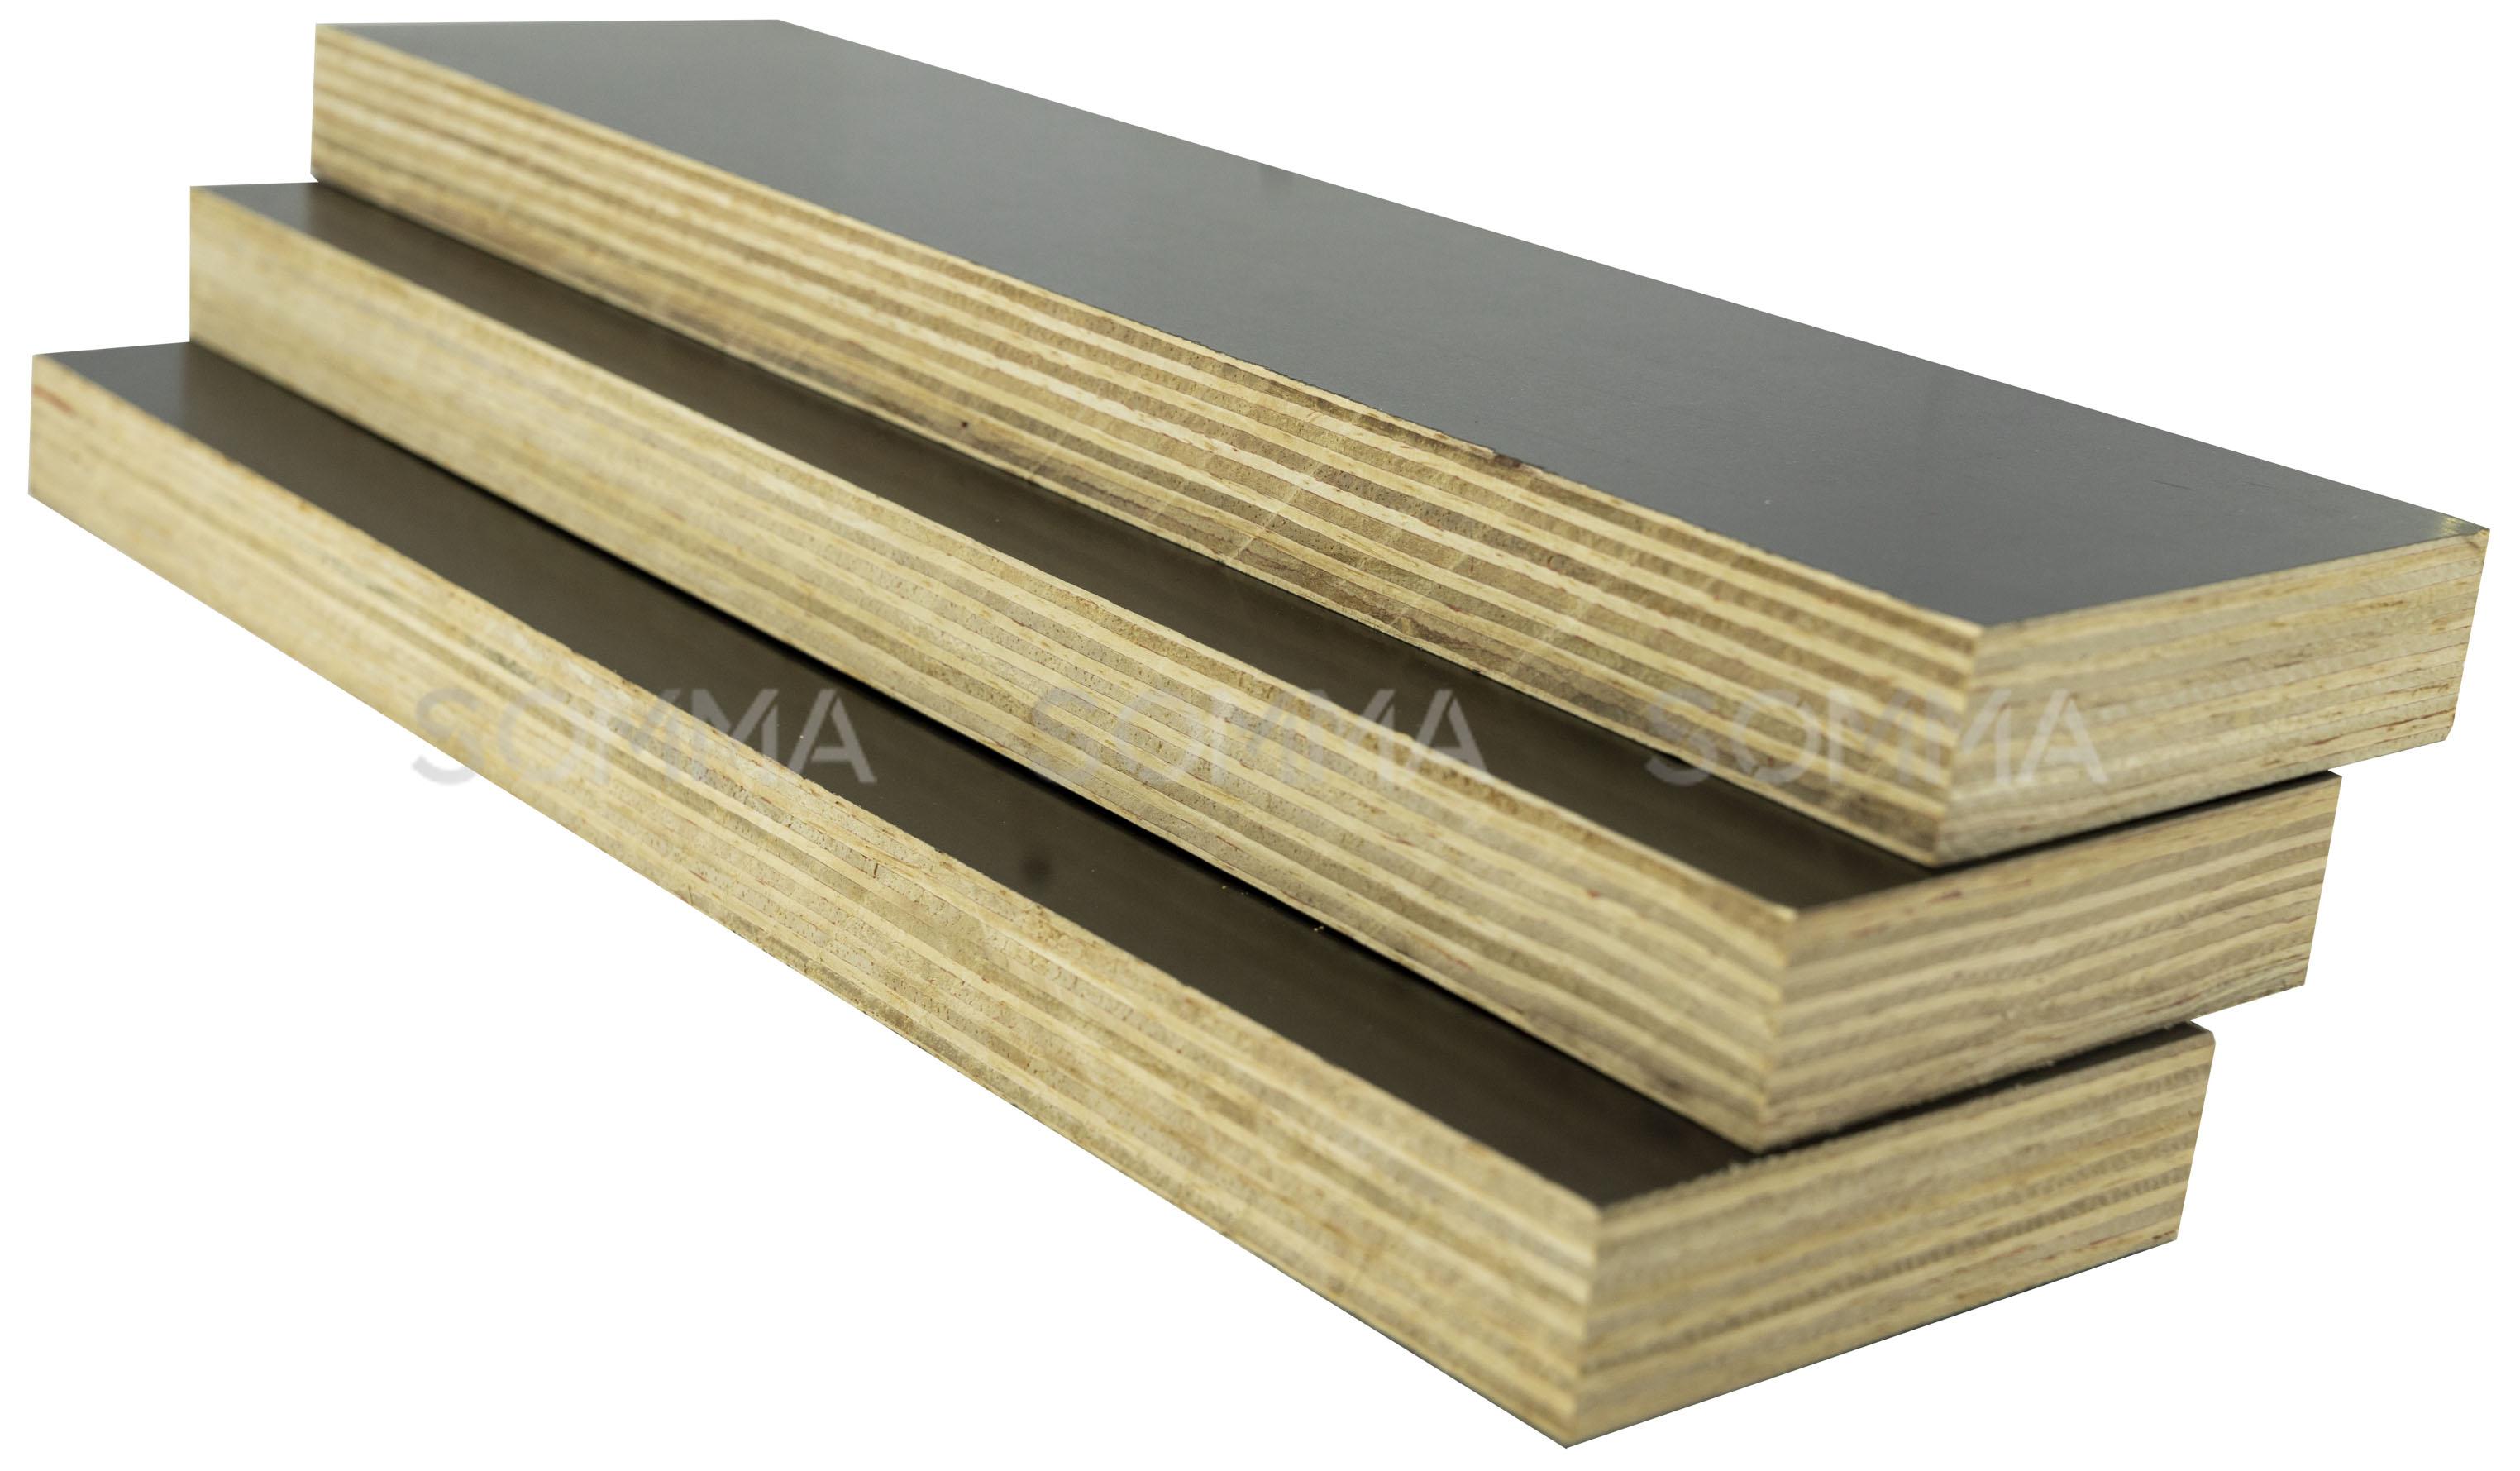 Vietnam plywood formwork